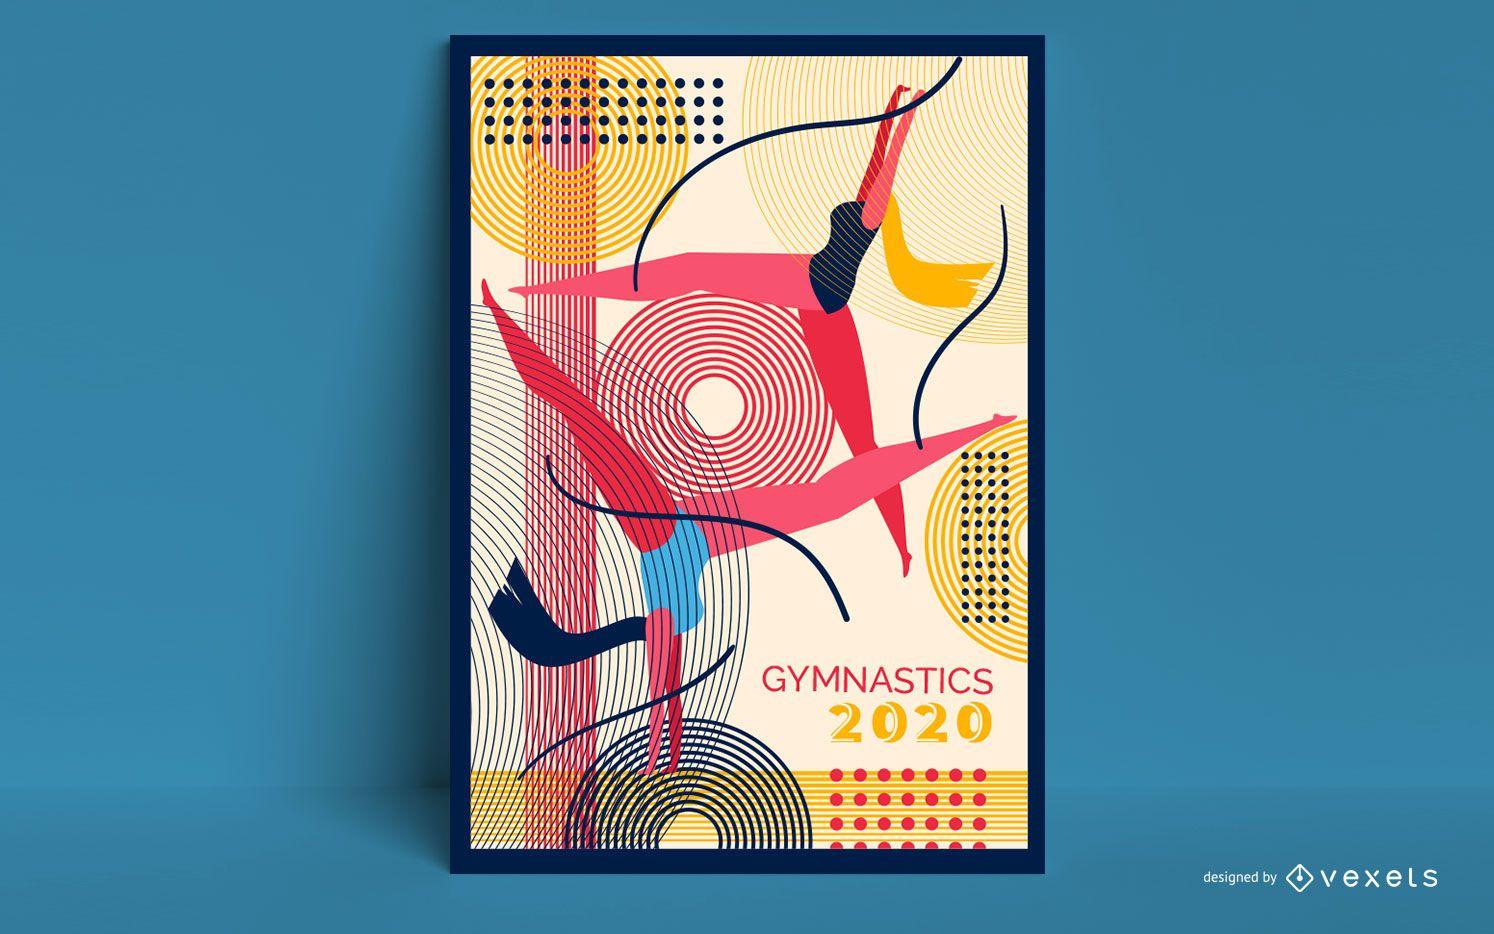 Gimnastics Tokyo 2020 Poster Design